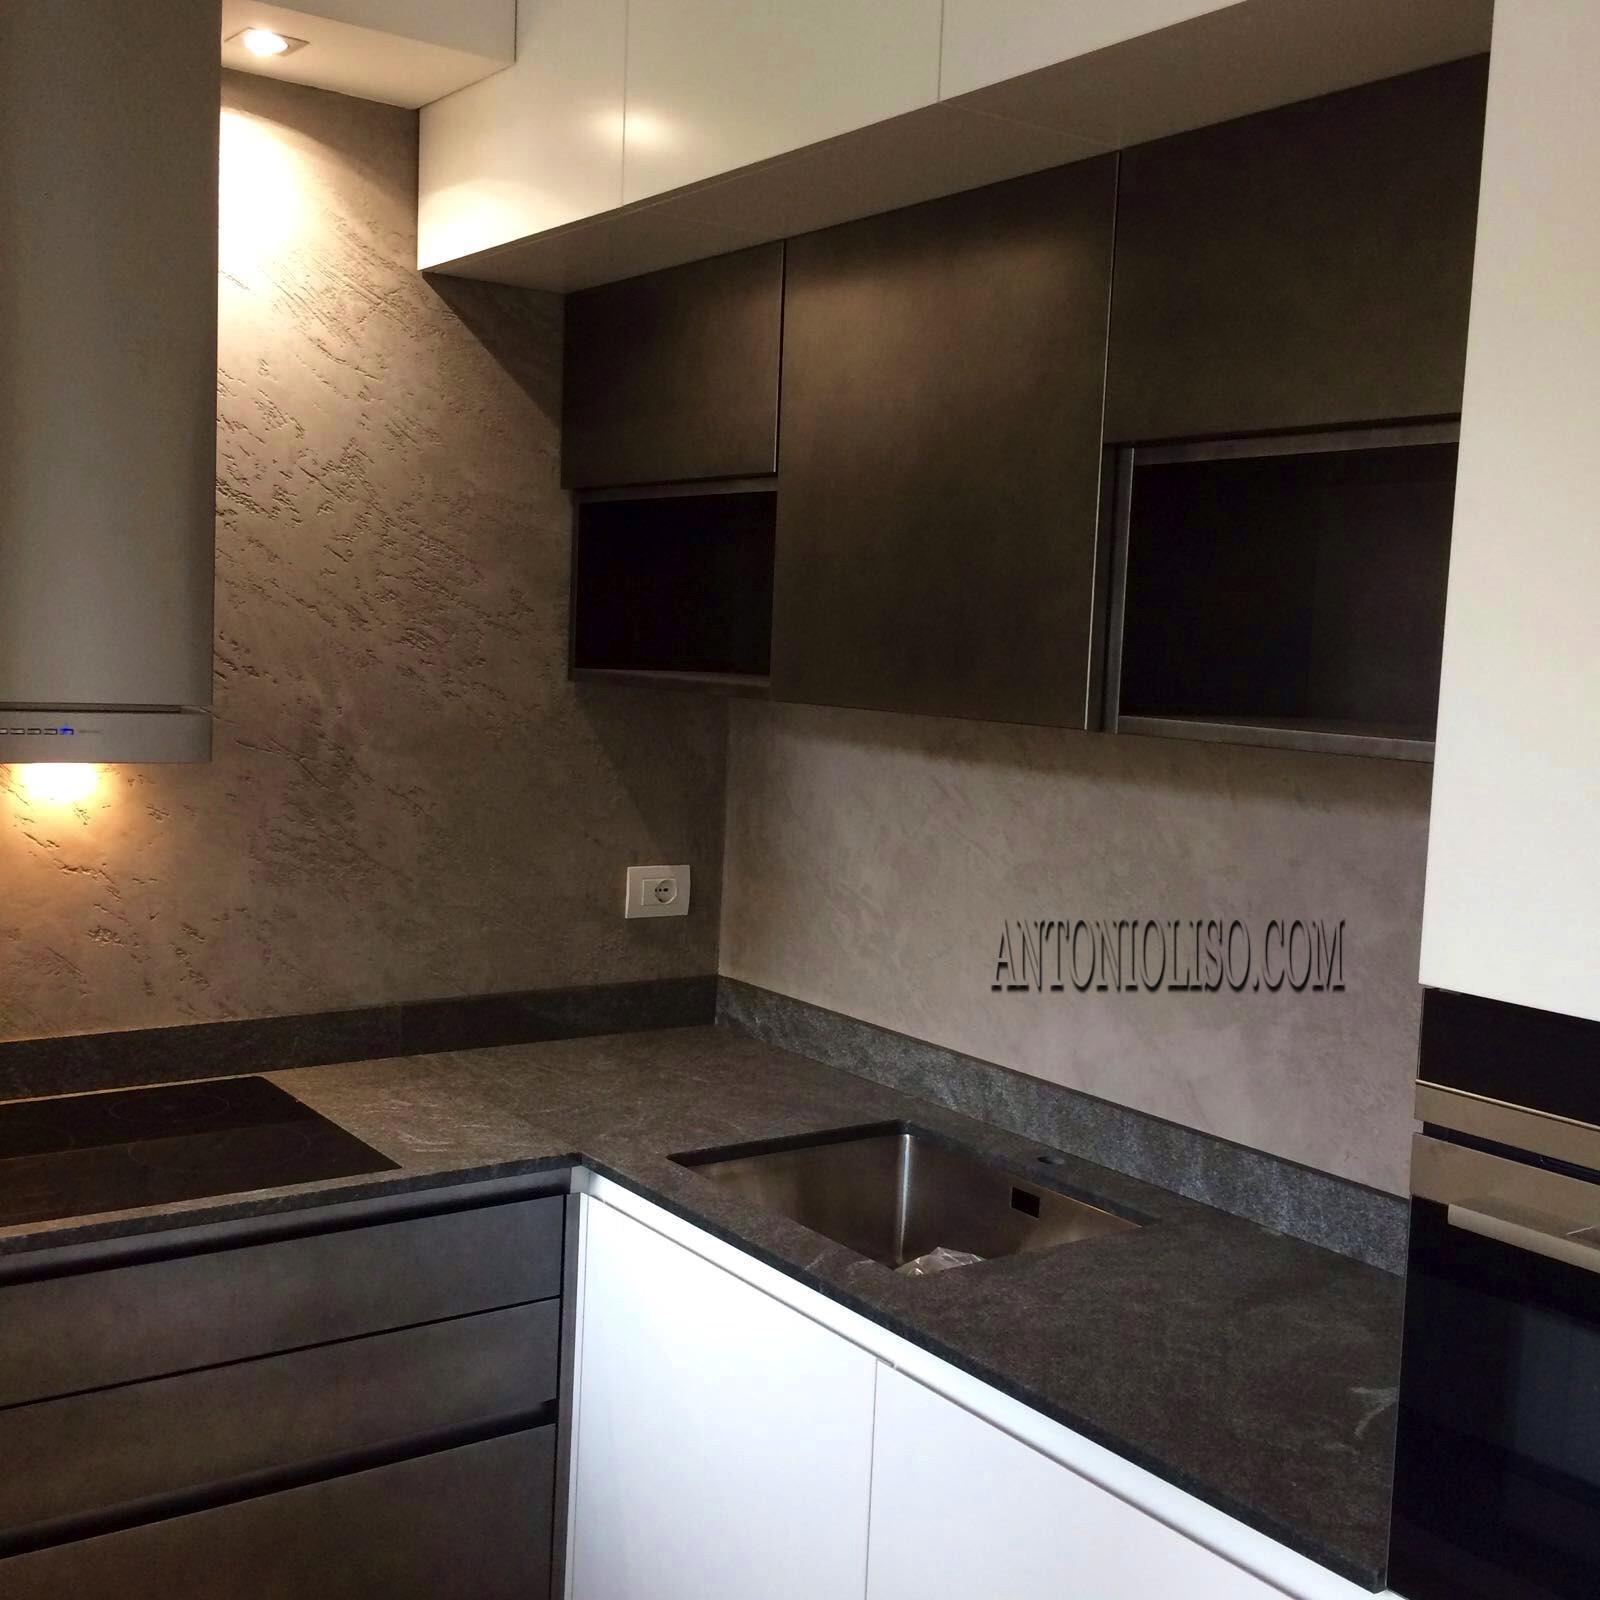 Stunning cucina senza piastrelle pictures ideas design - Cucina senza piastrelle ...